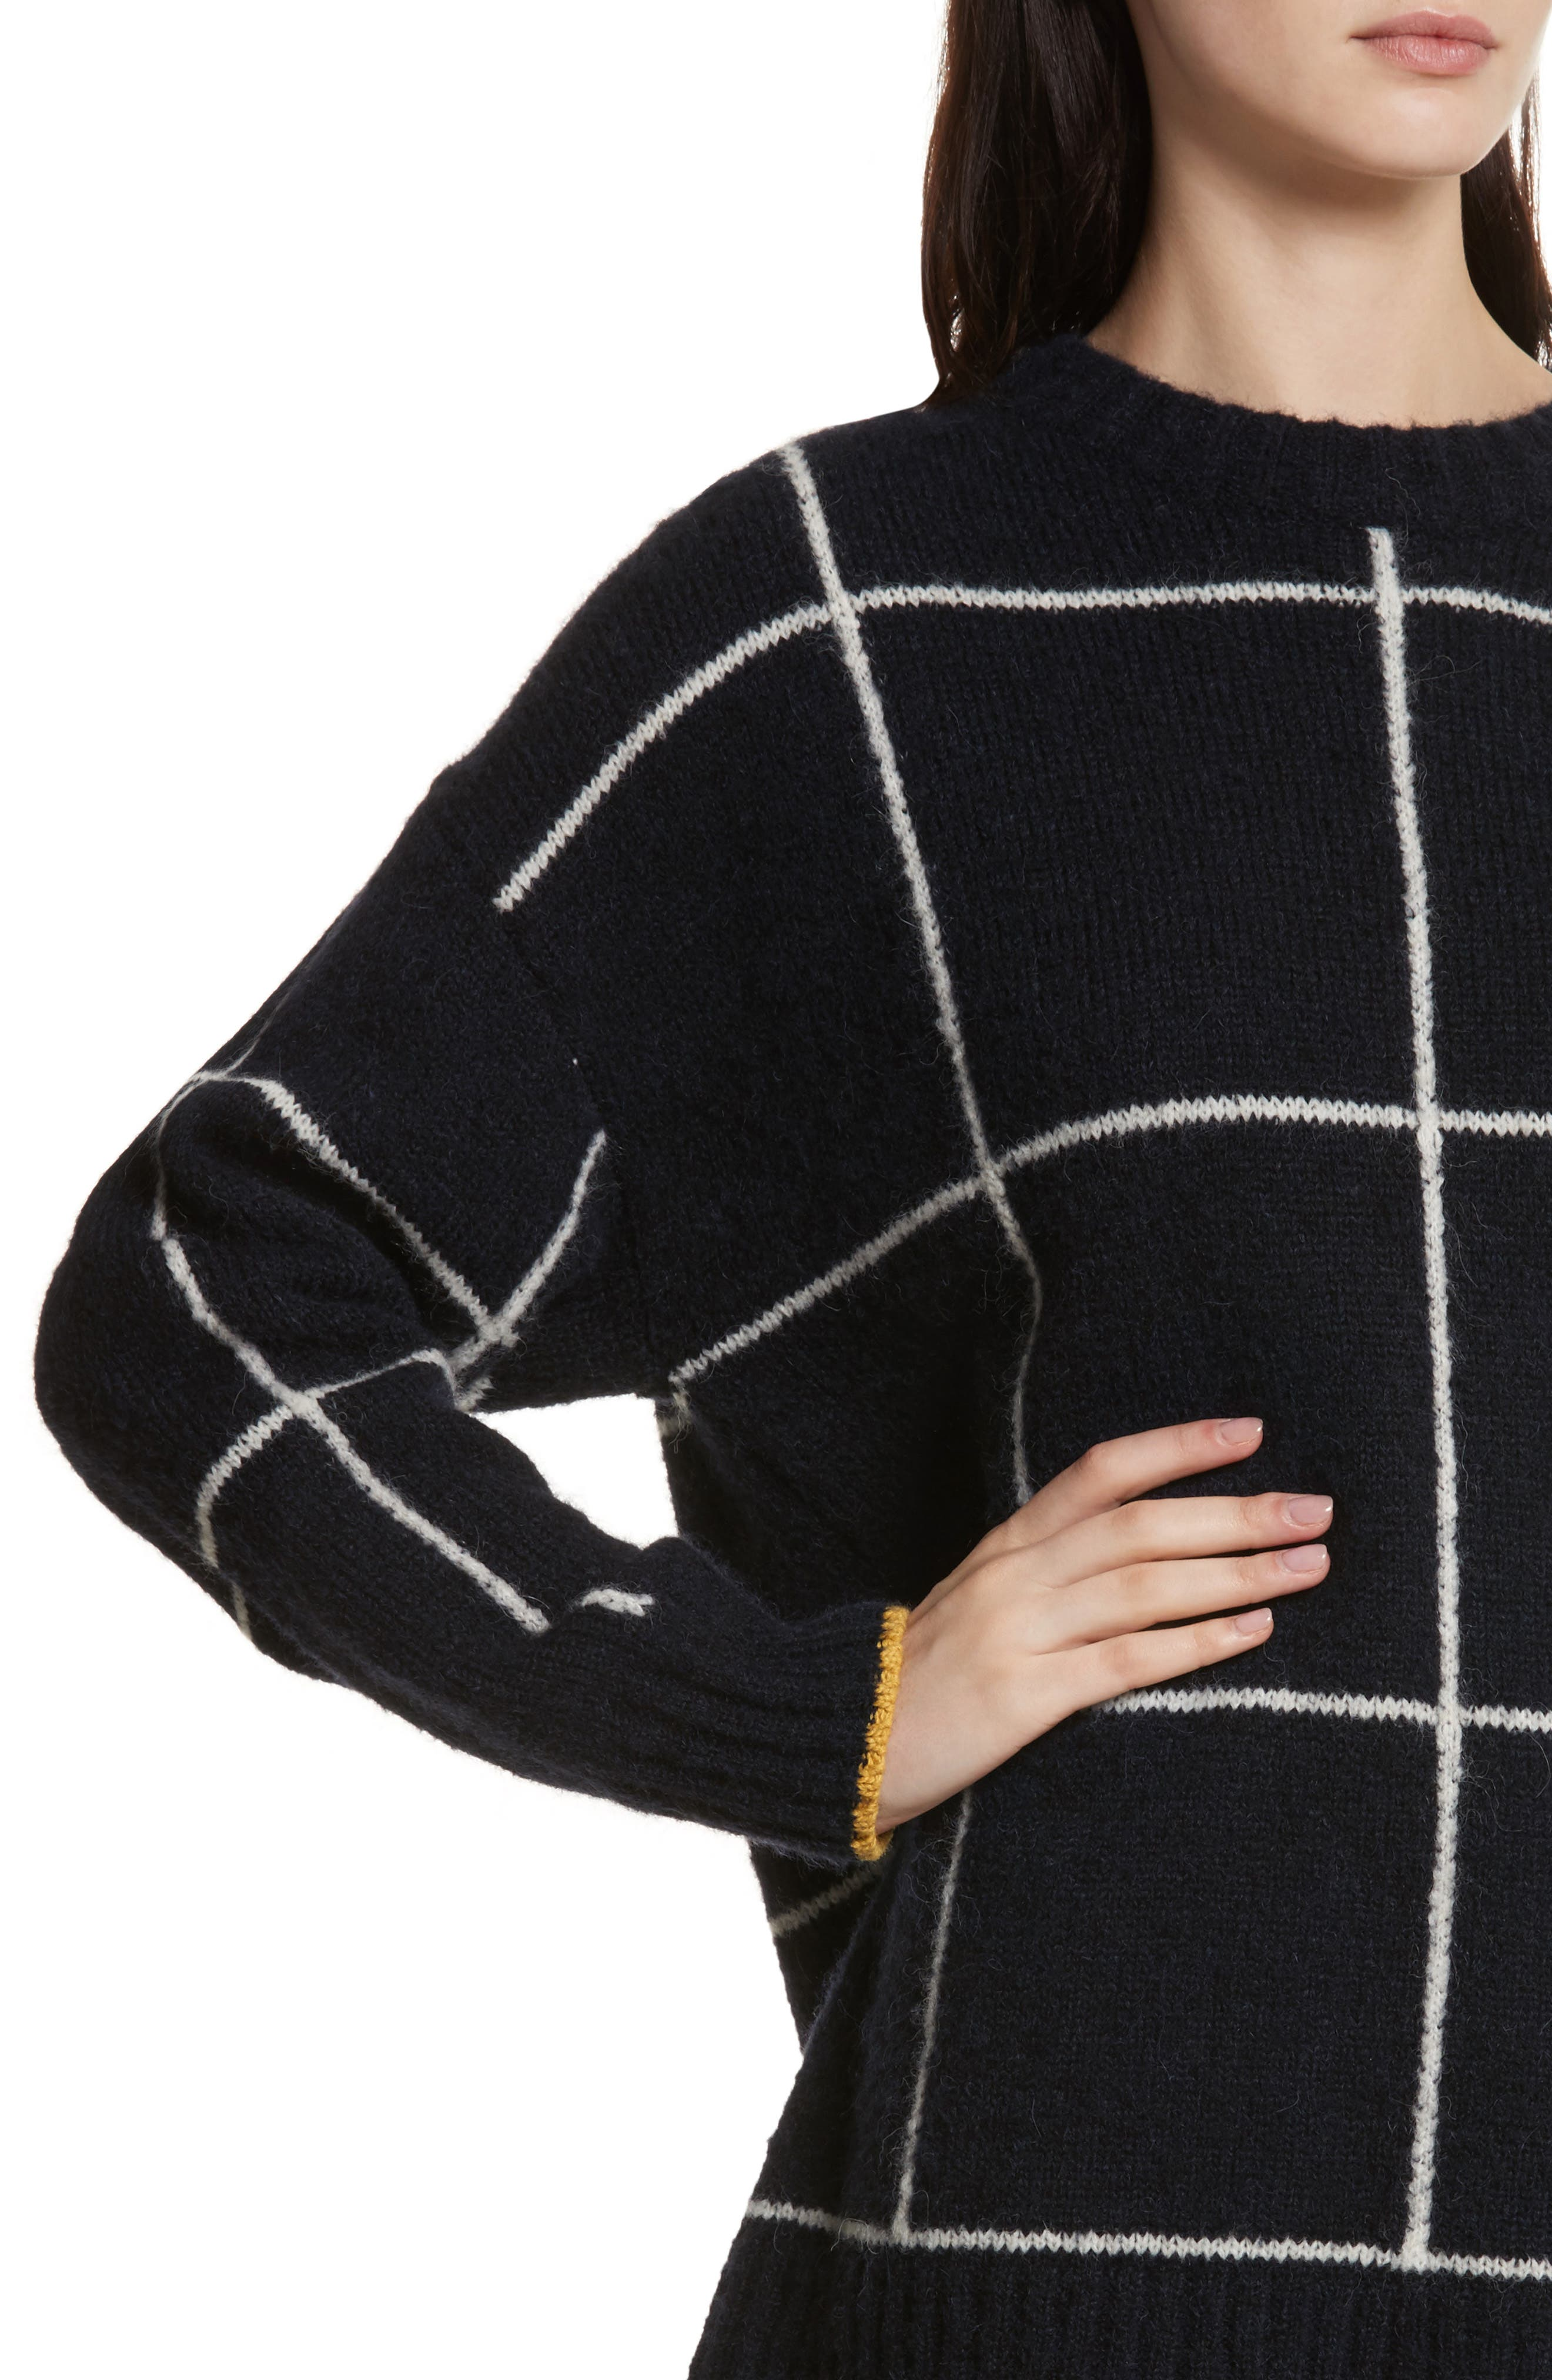 Fionn Windowpane Oversized Sweater,                             Alternate thumbnail 4, color,                             470